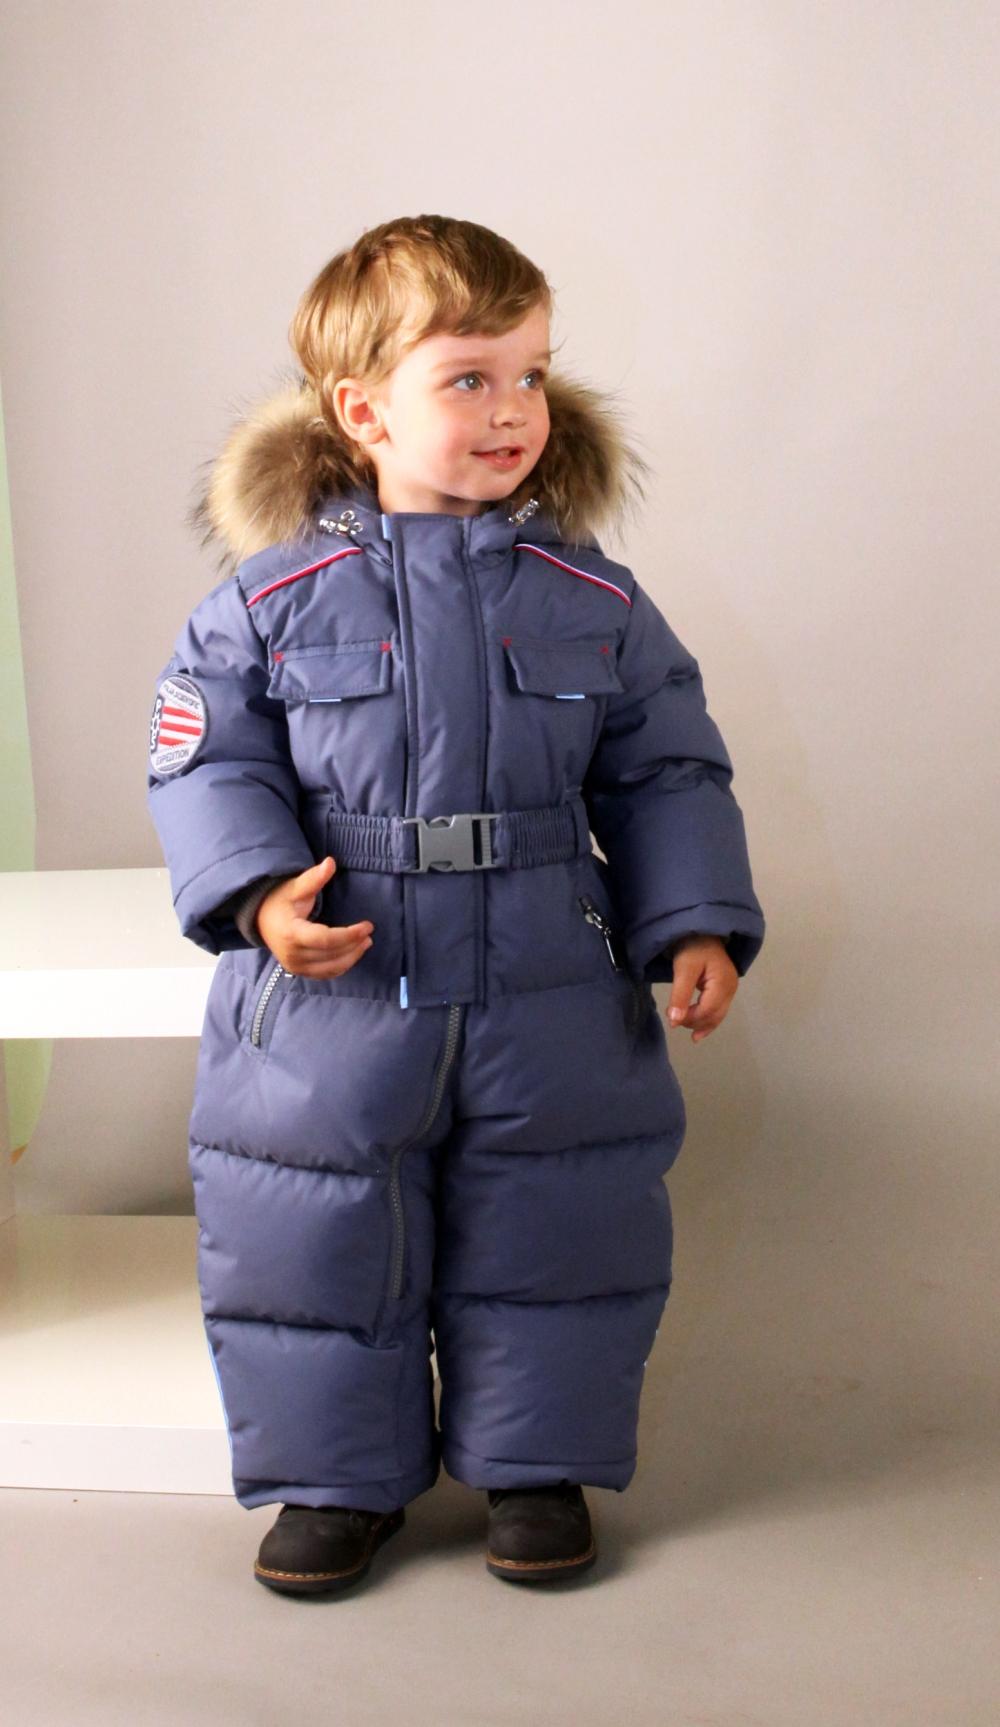 Арктилайн детская одежда интернет магазин 4